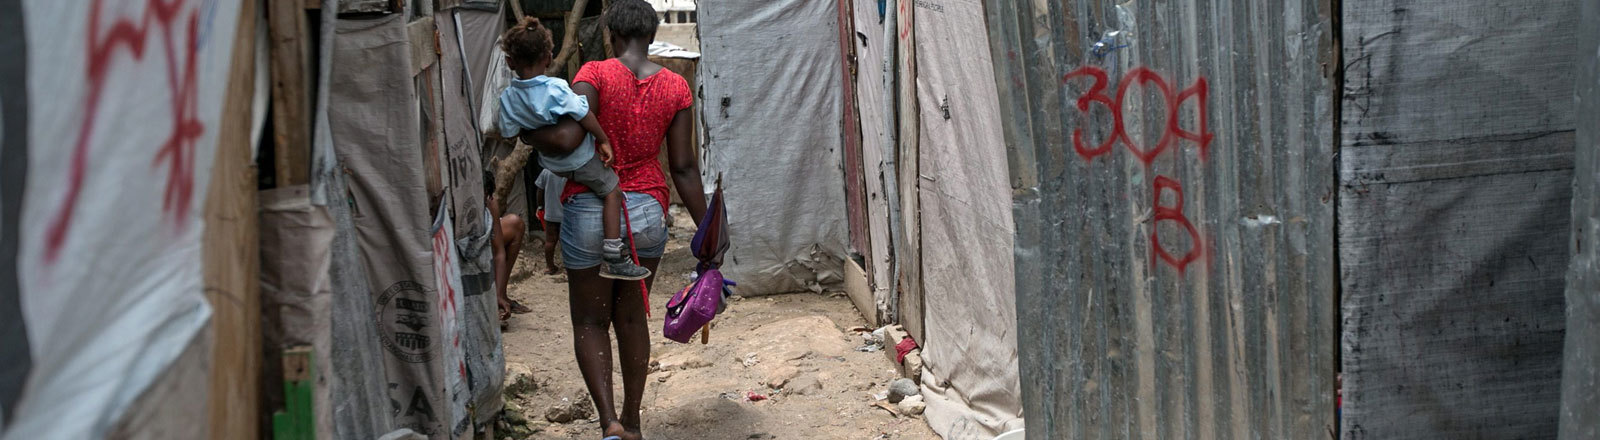 Frau geht durch ein Camp.